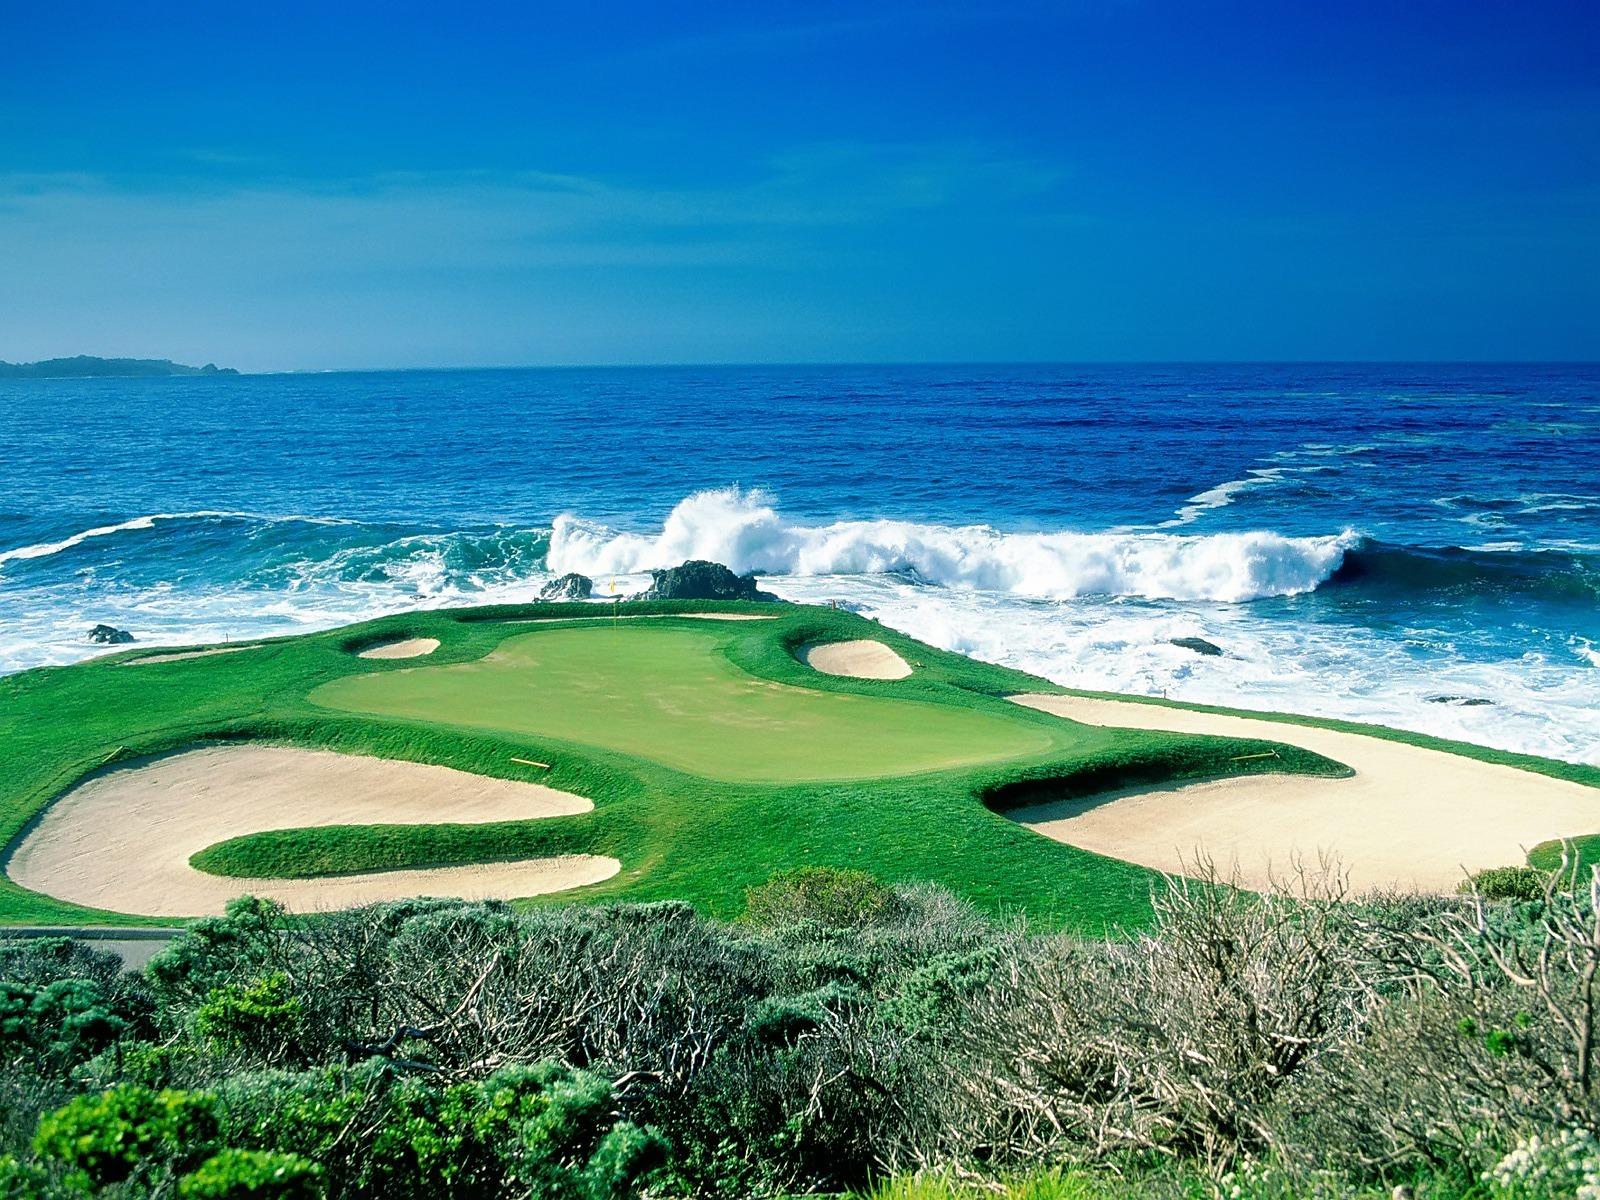 Golf club deals - Pic of Golf Hole.